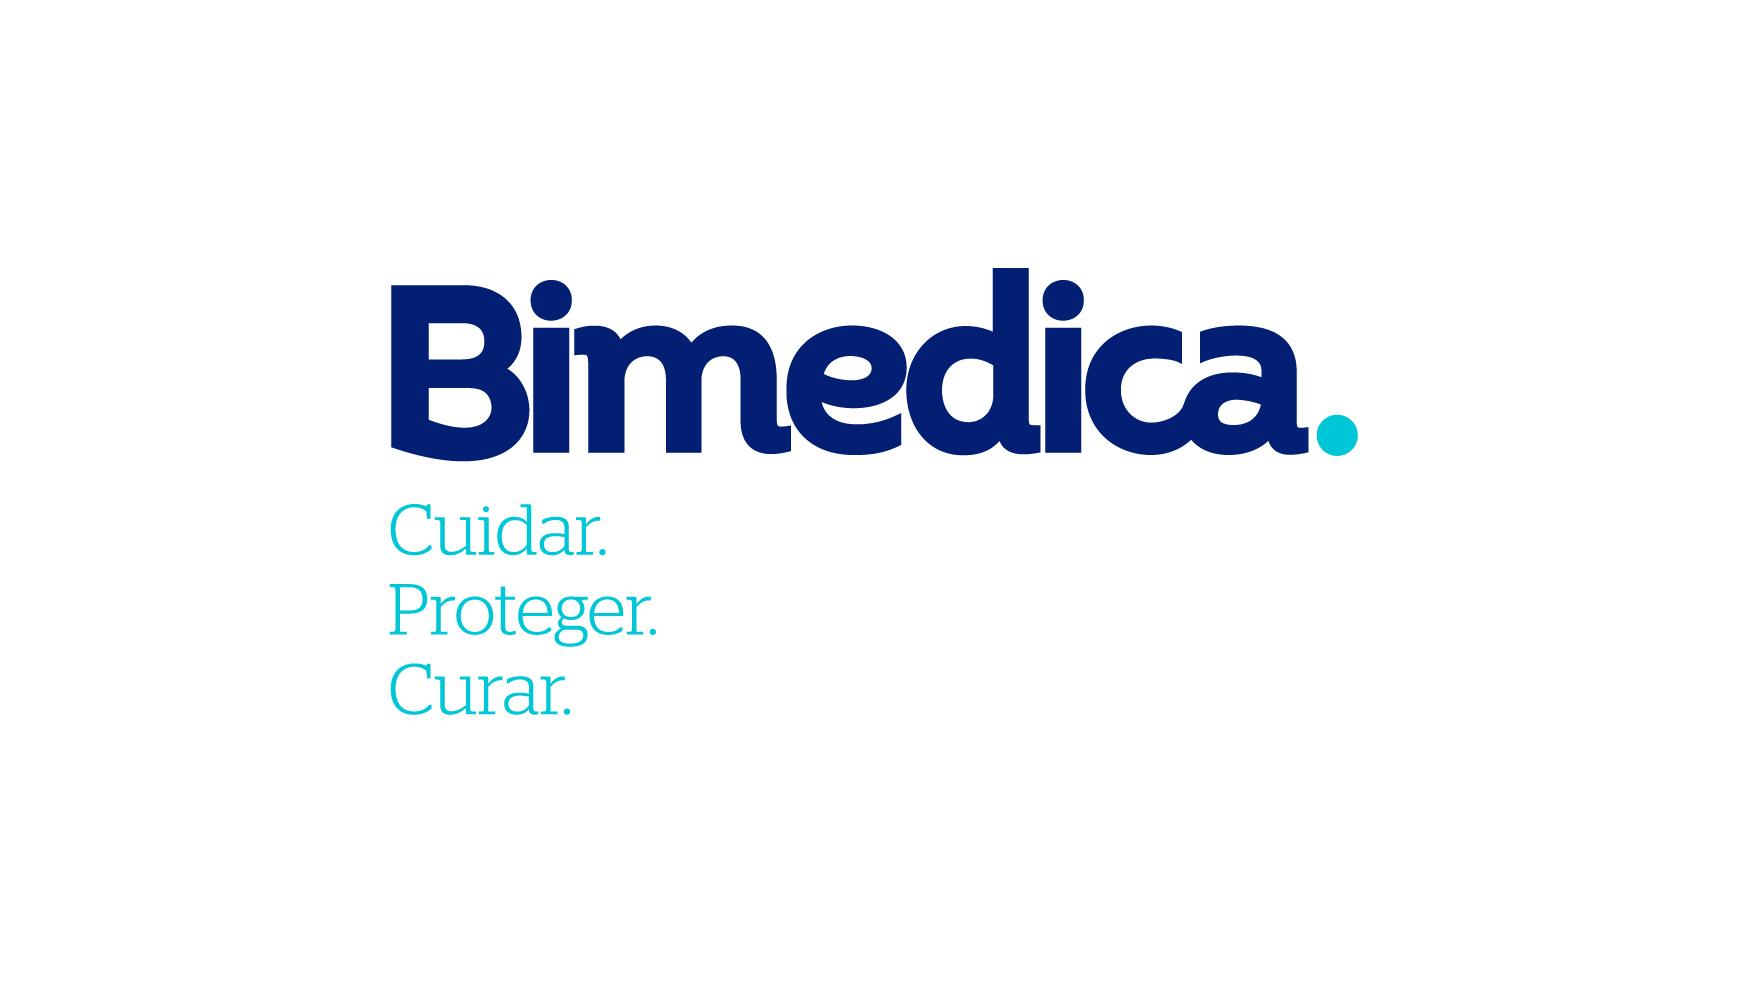 bimedica logo